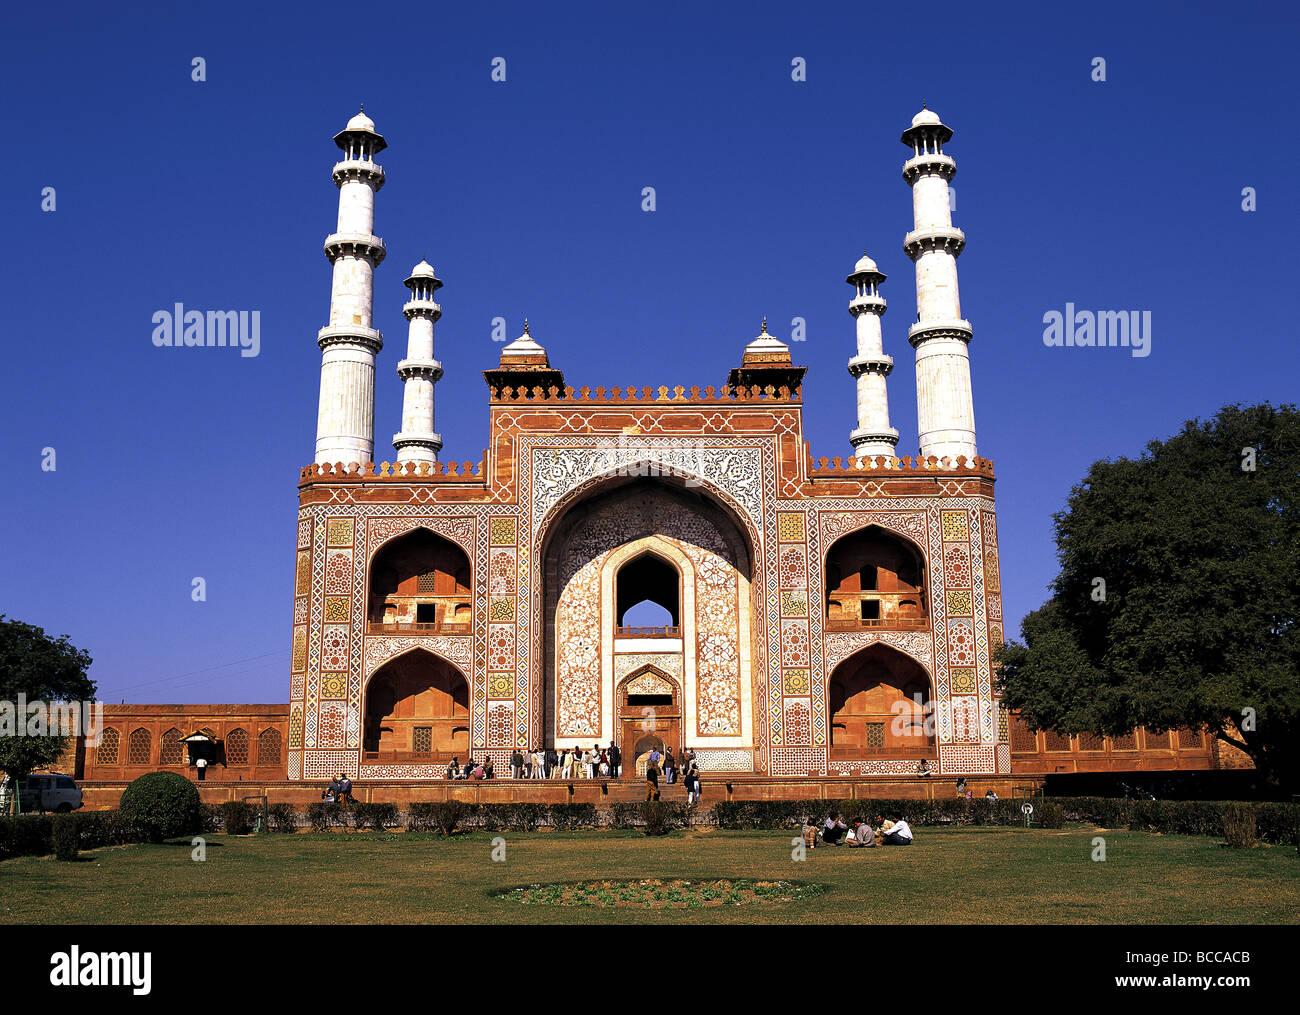 Gatehouse to Akbar Tomb,  Sikandra, India - Stock Image